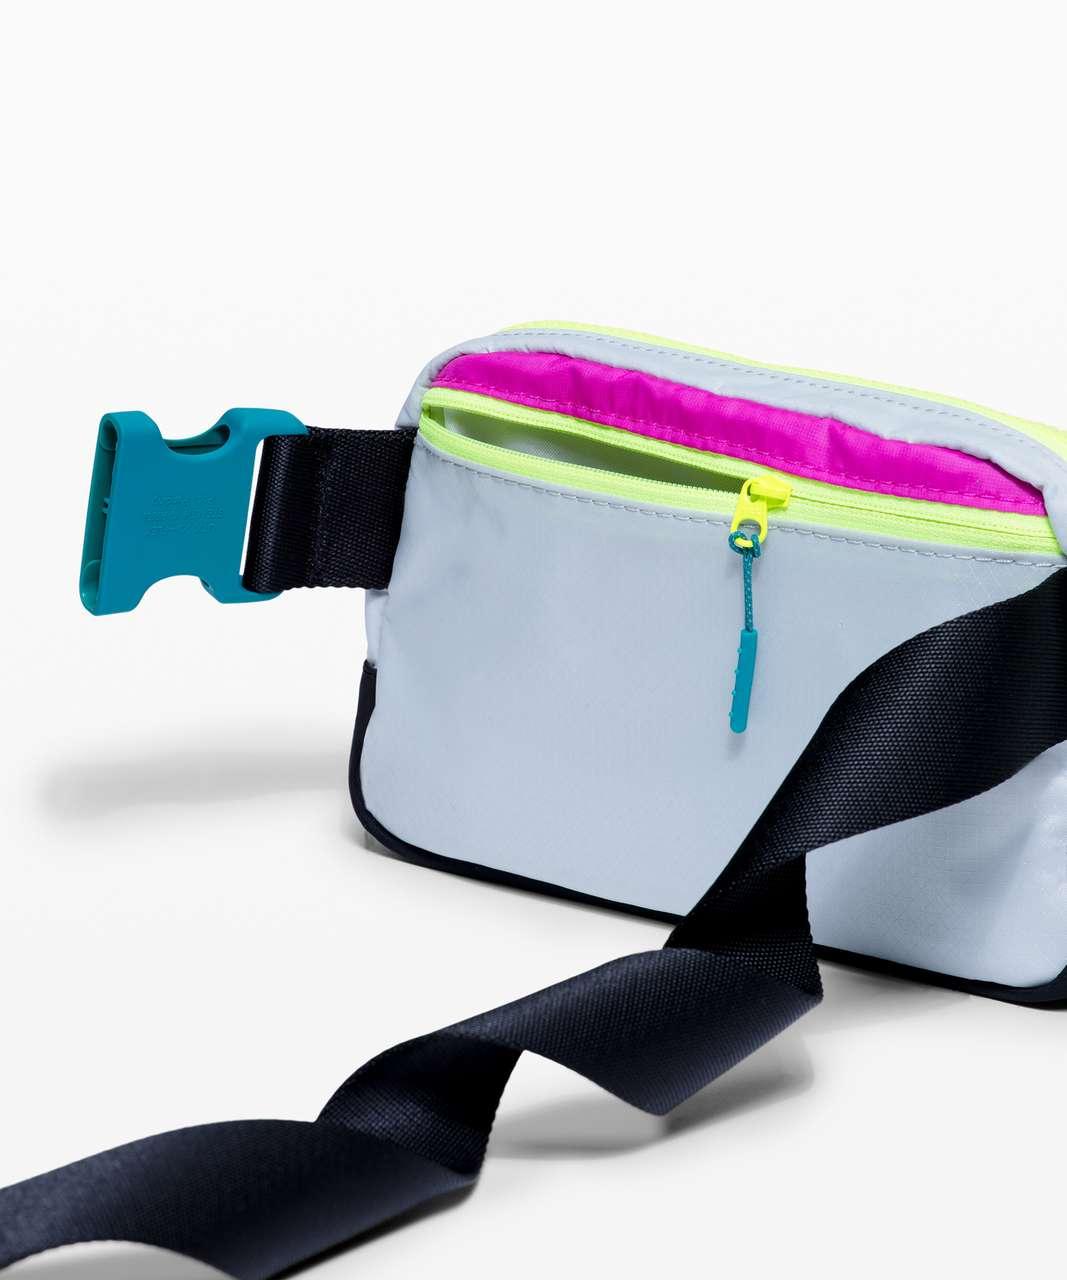 Lululemon Everywhere Belt Bag *1L - Highlight Purple / Vapor / Intense Teal